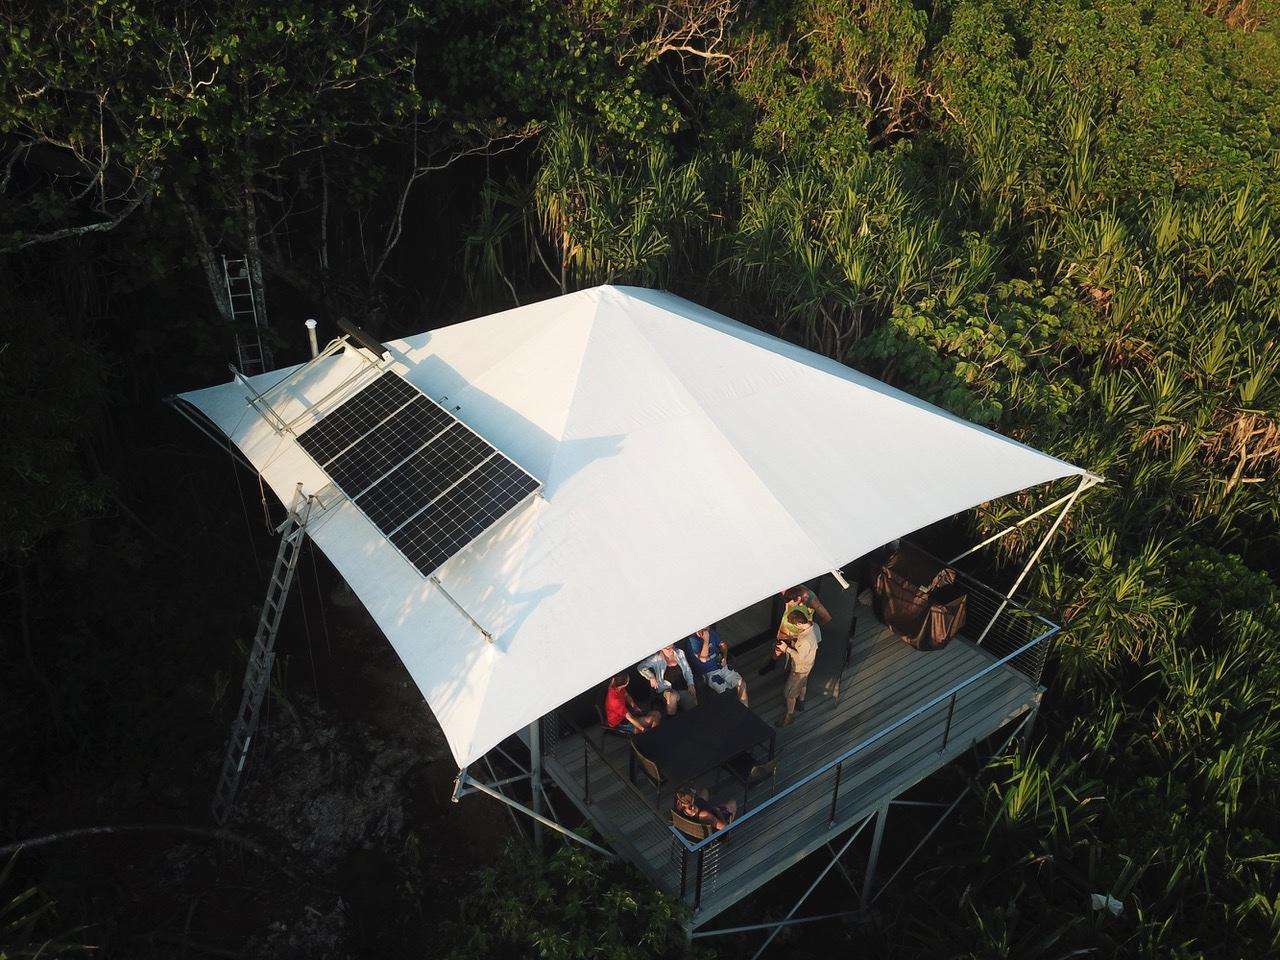 SwellLodge-Offgrid-Solar-Power-System-Christmas-Island-5.jpg